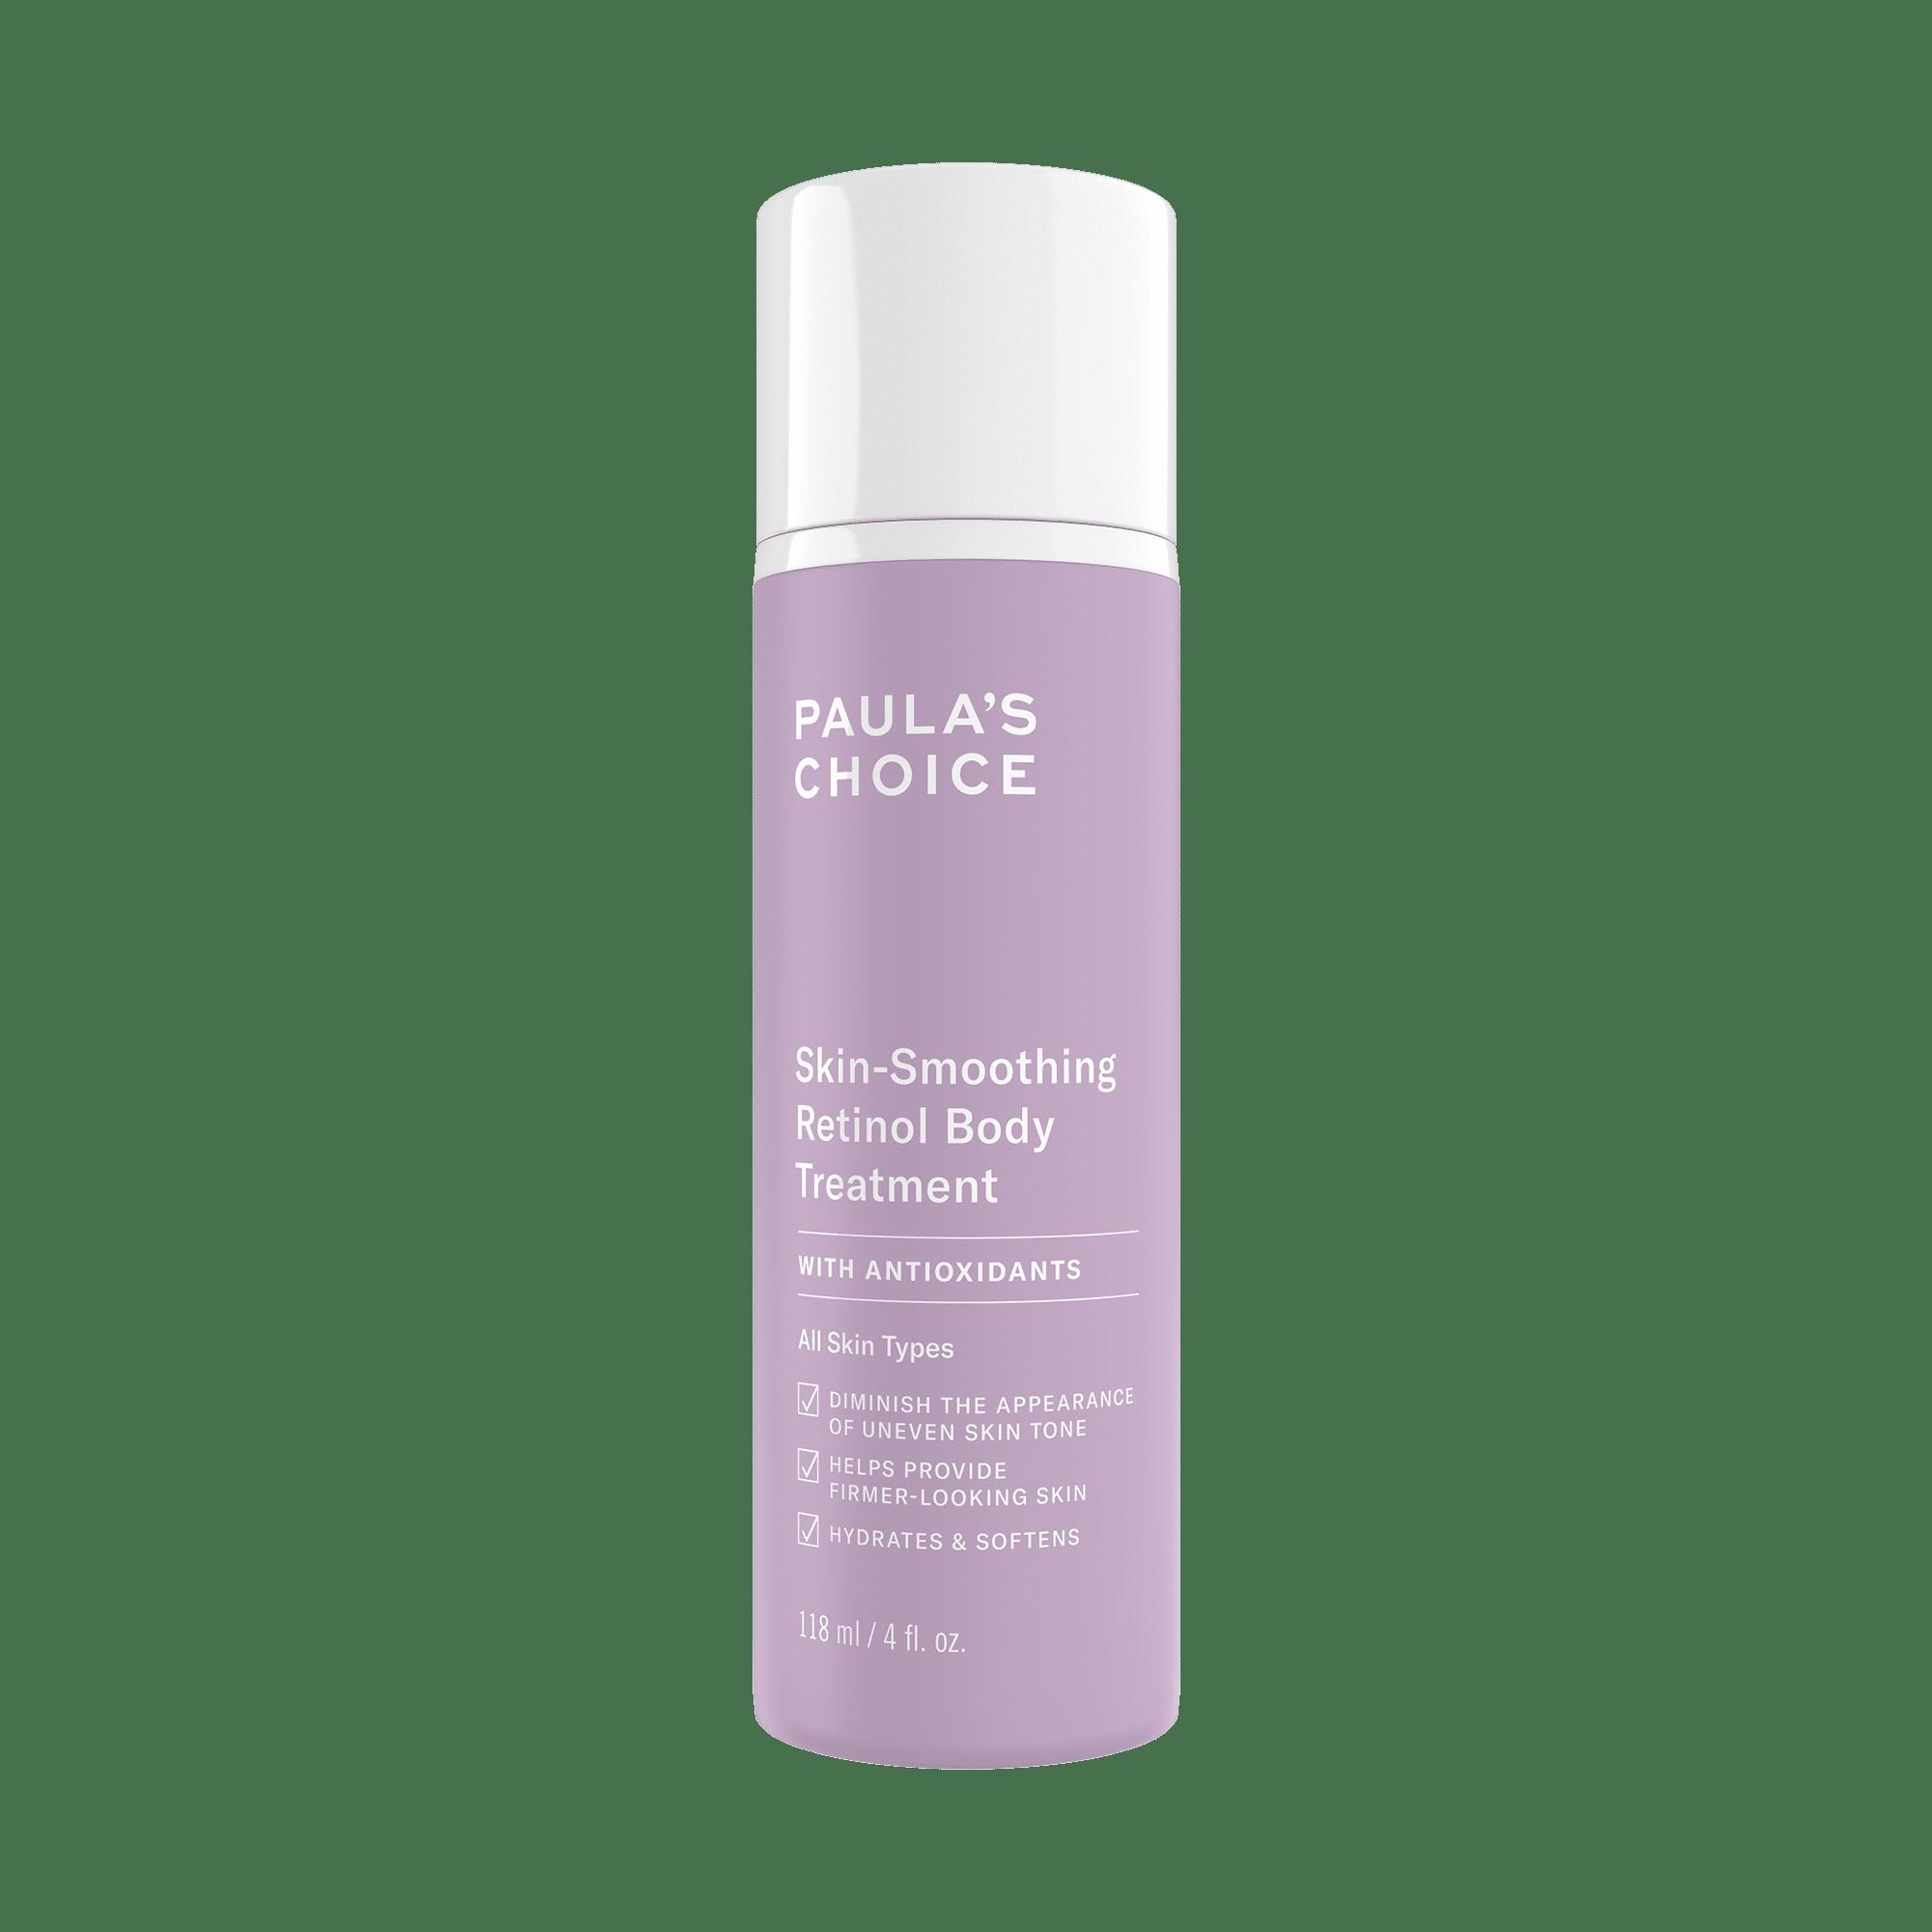 Paula's Choice - Retinol Skin-Smoothing Body Treatment